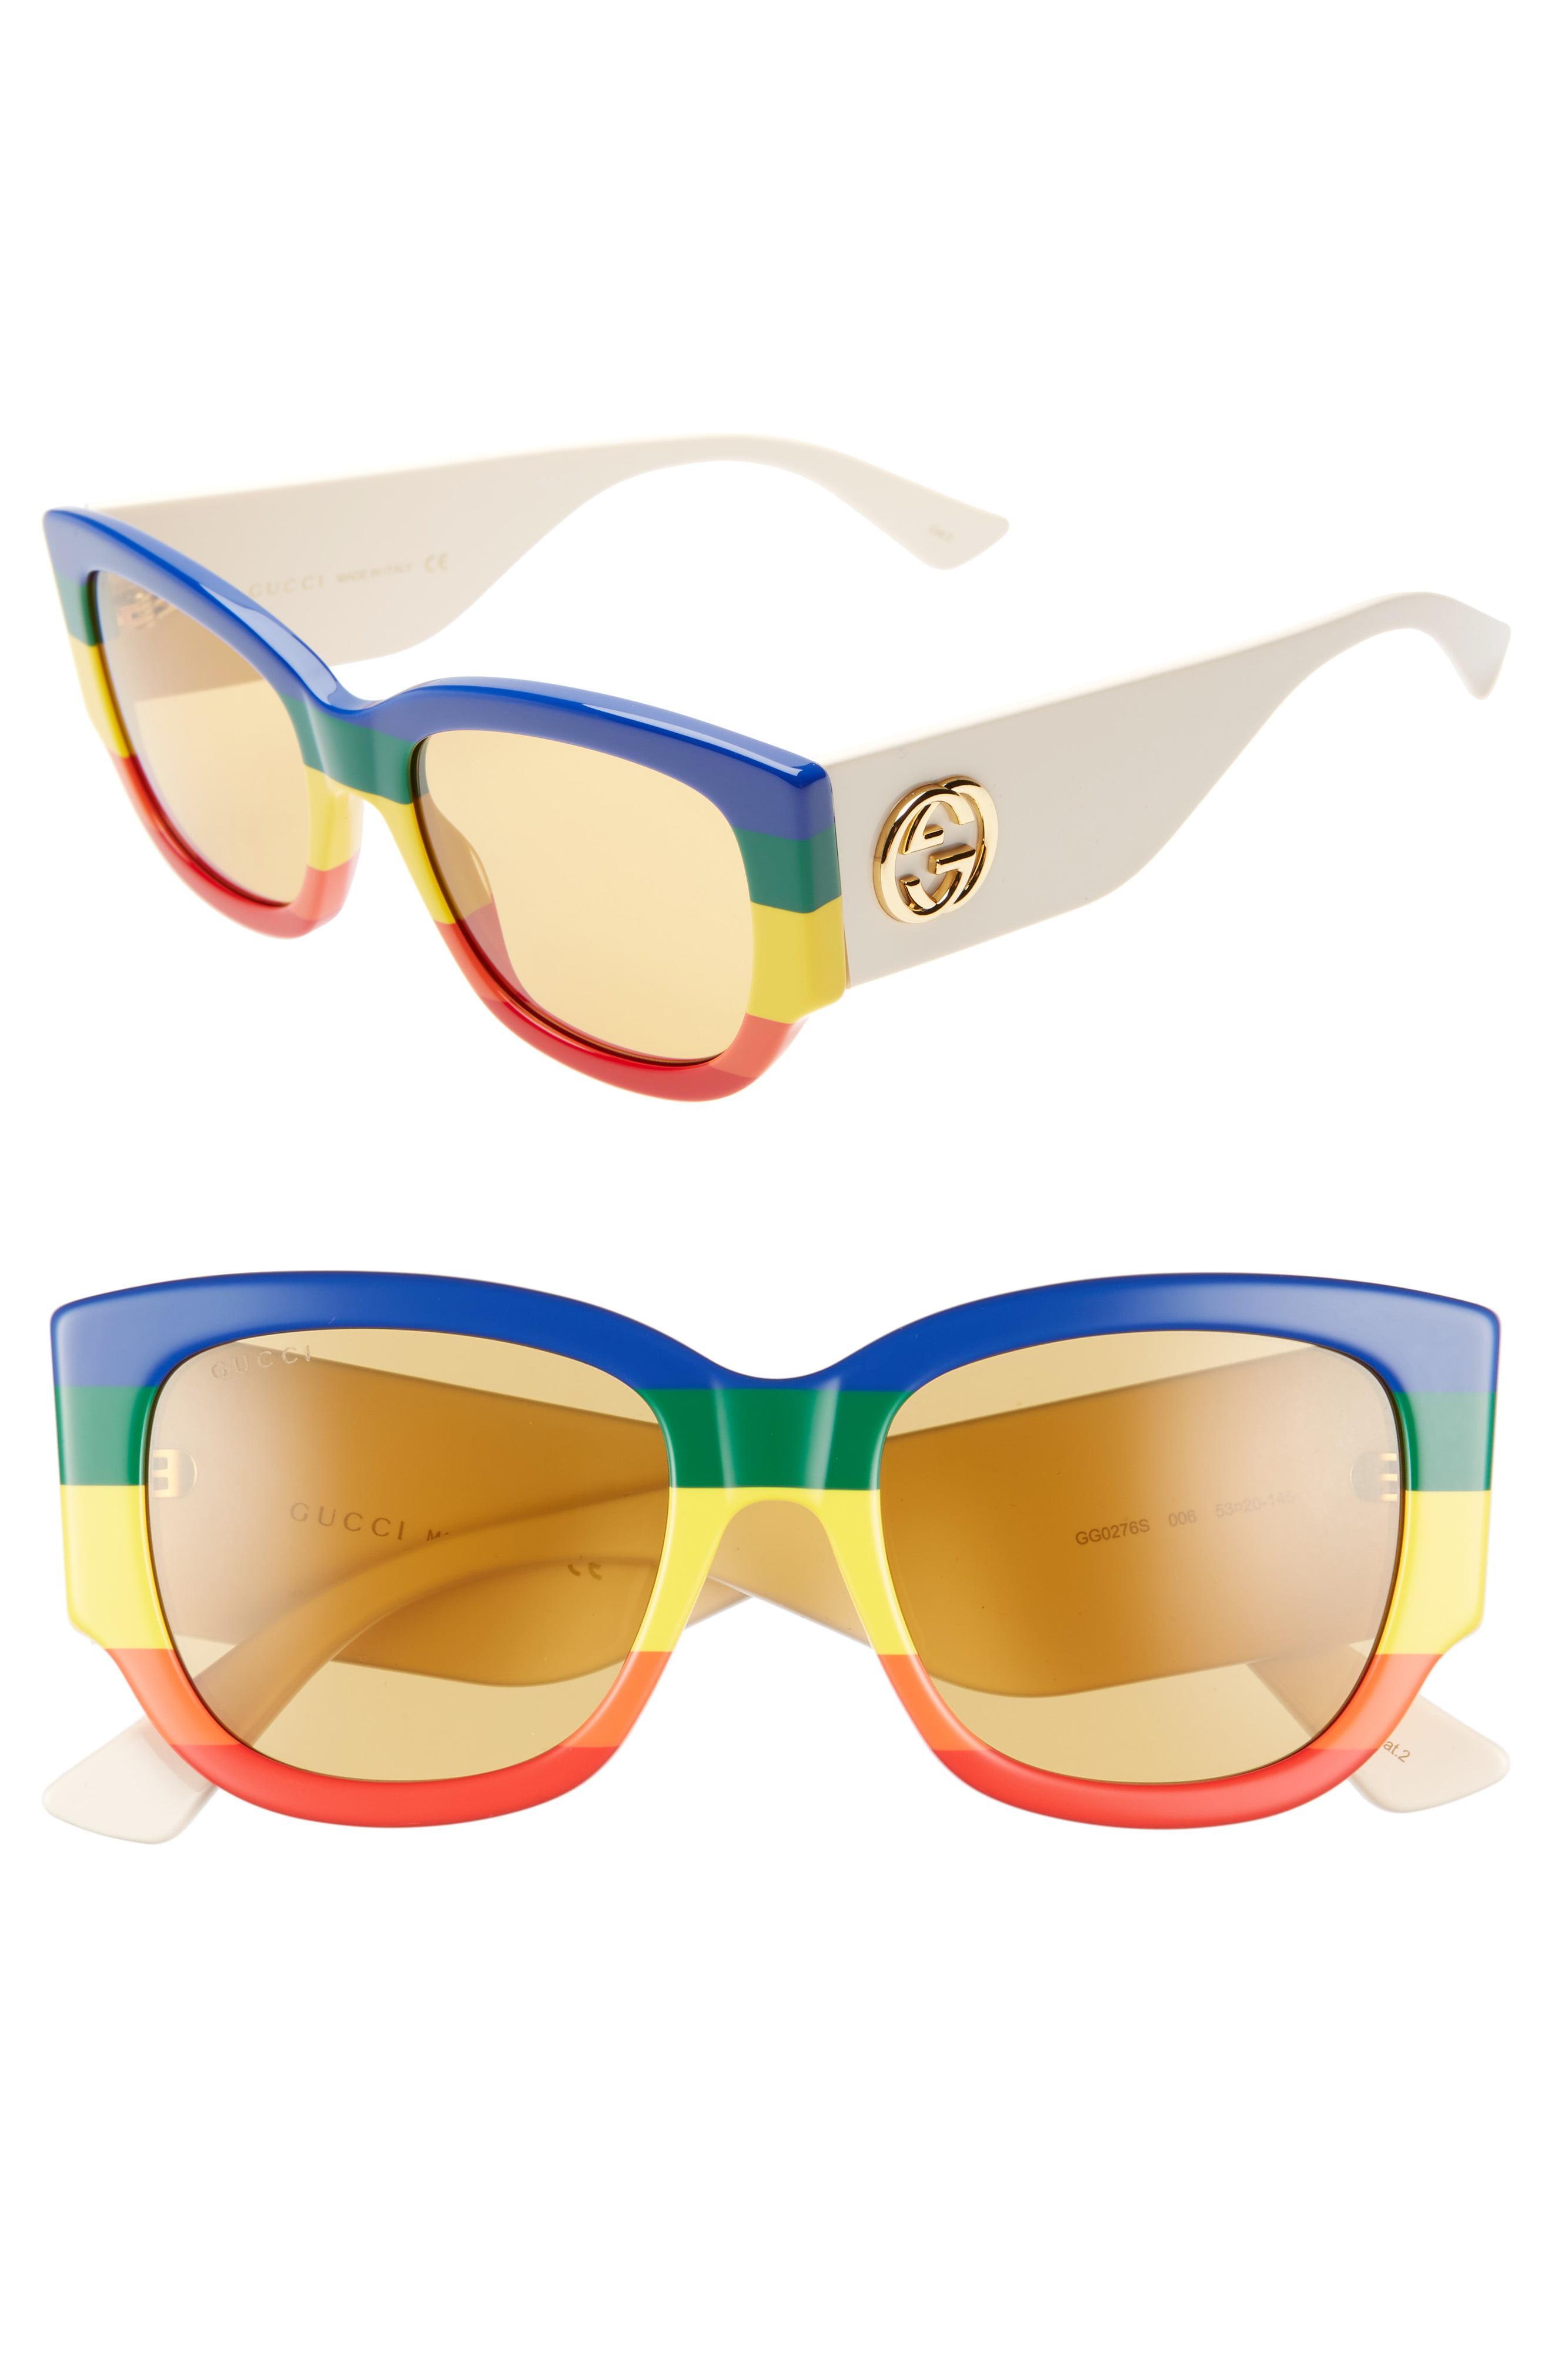 088720b79 Gucci - 53mm Striped Cat Eye Sunglasses - Multicolor - Lyst. View fullscreen